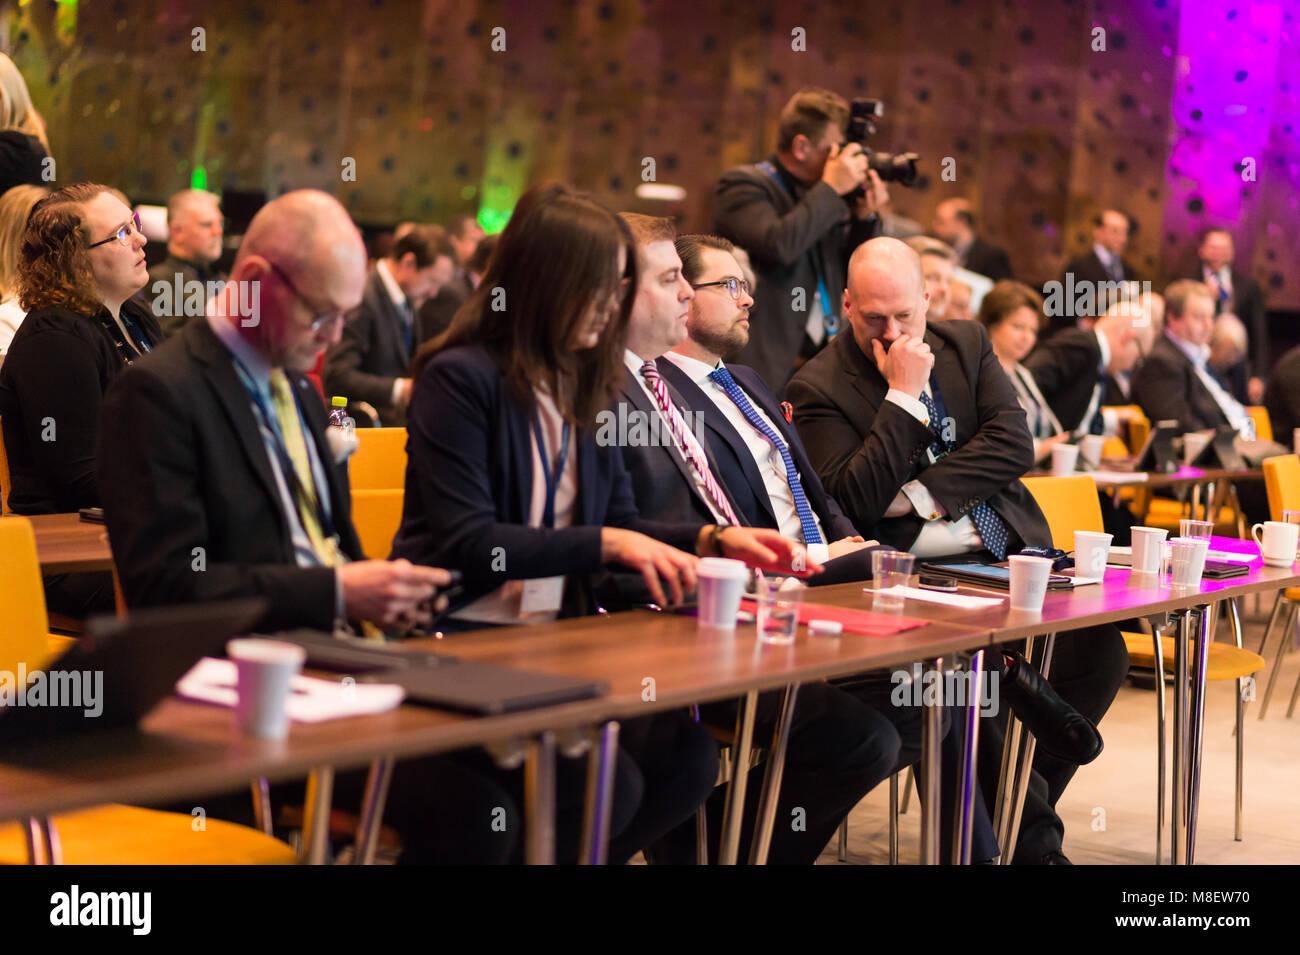 Stockholm, Sweden, March 17, 2018. Sweden Democrats (SD) Election Conference 2018. MP Sven-Olof Sallstroem (right), - Stock Image